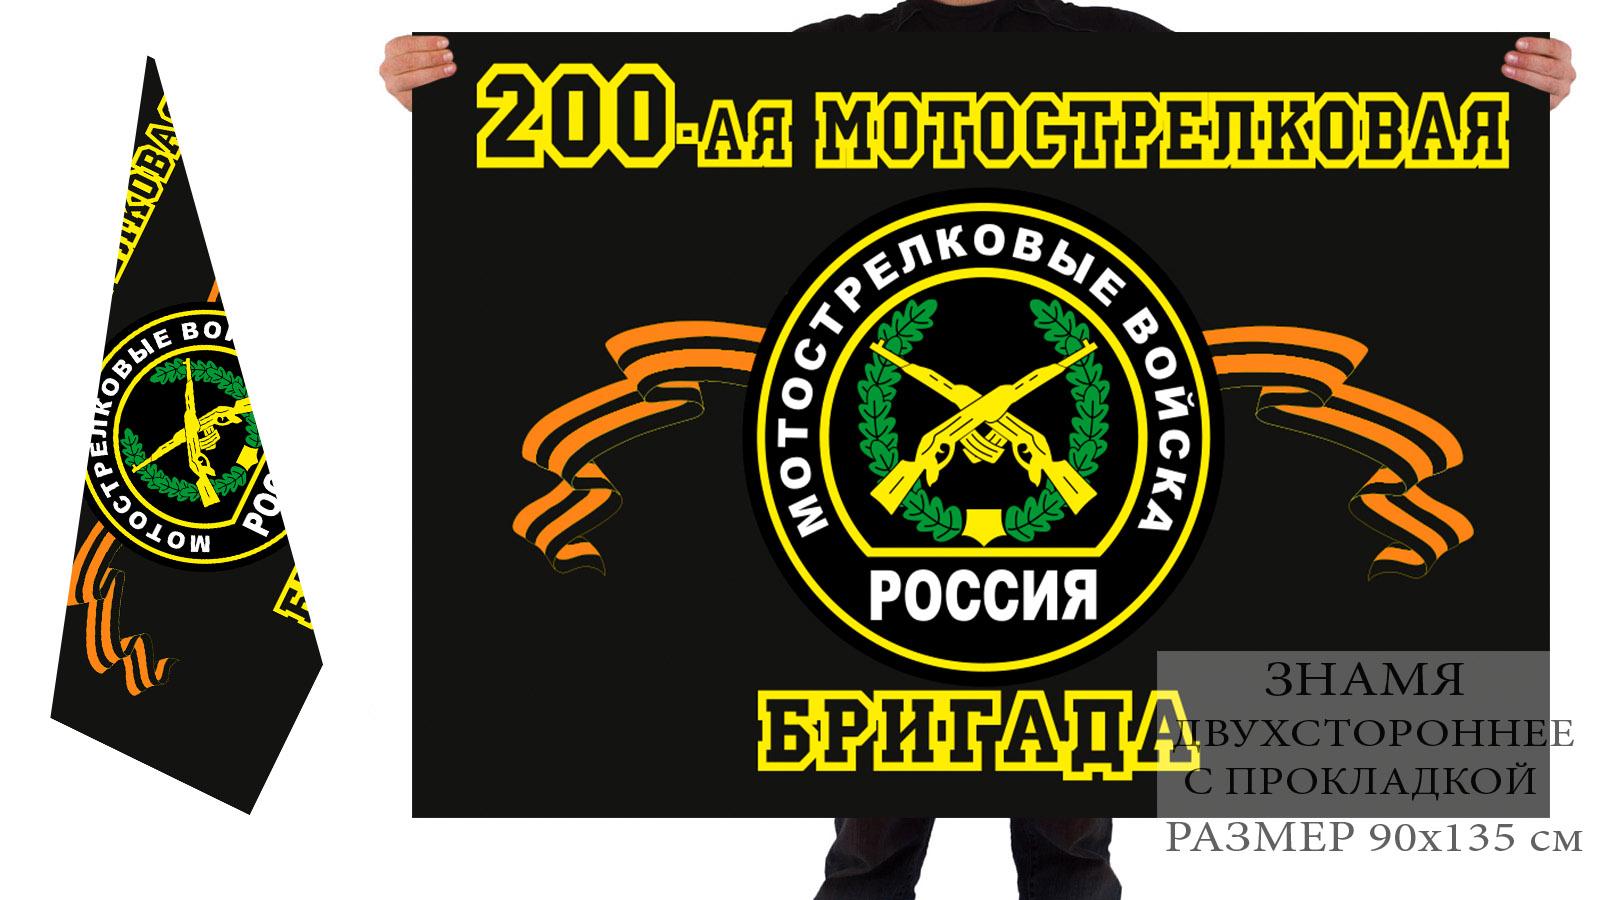 Двусторонний флаг 200 мотострелковой бригады